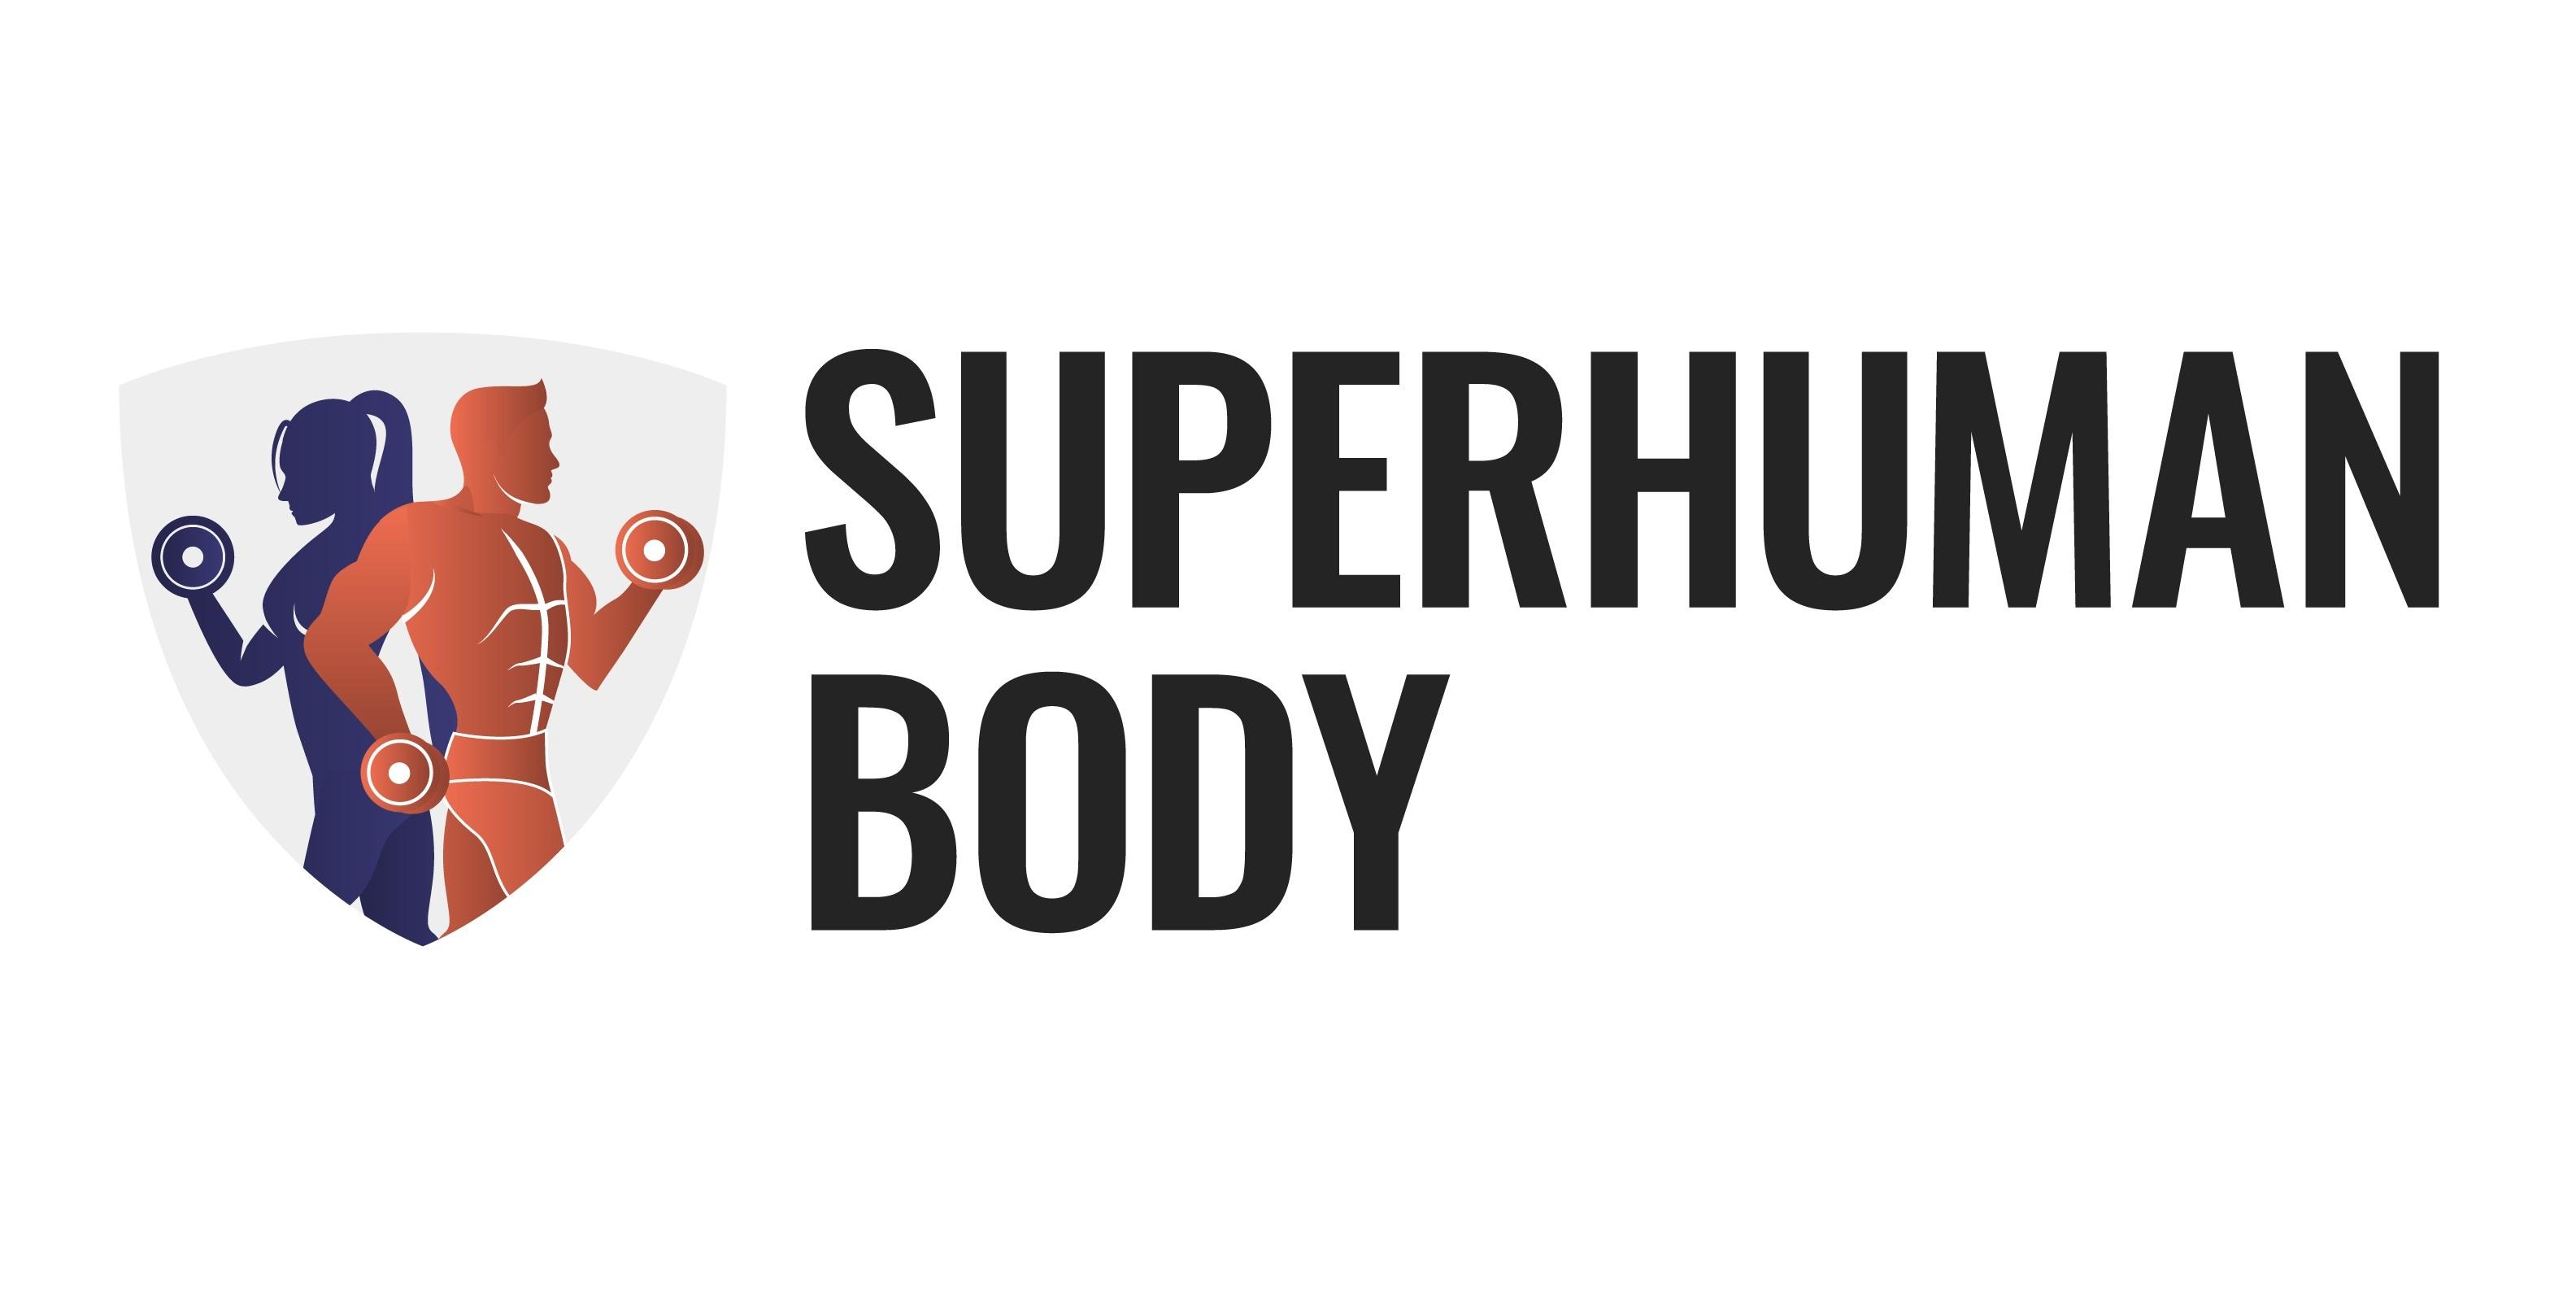 Build Your SuperHuman Body: The MasterClass